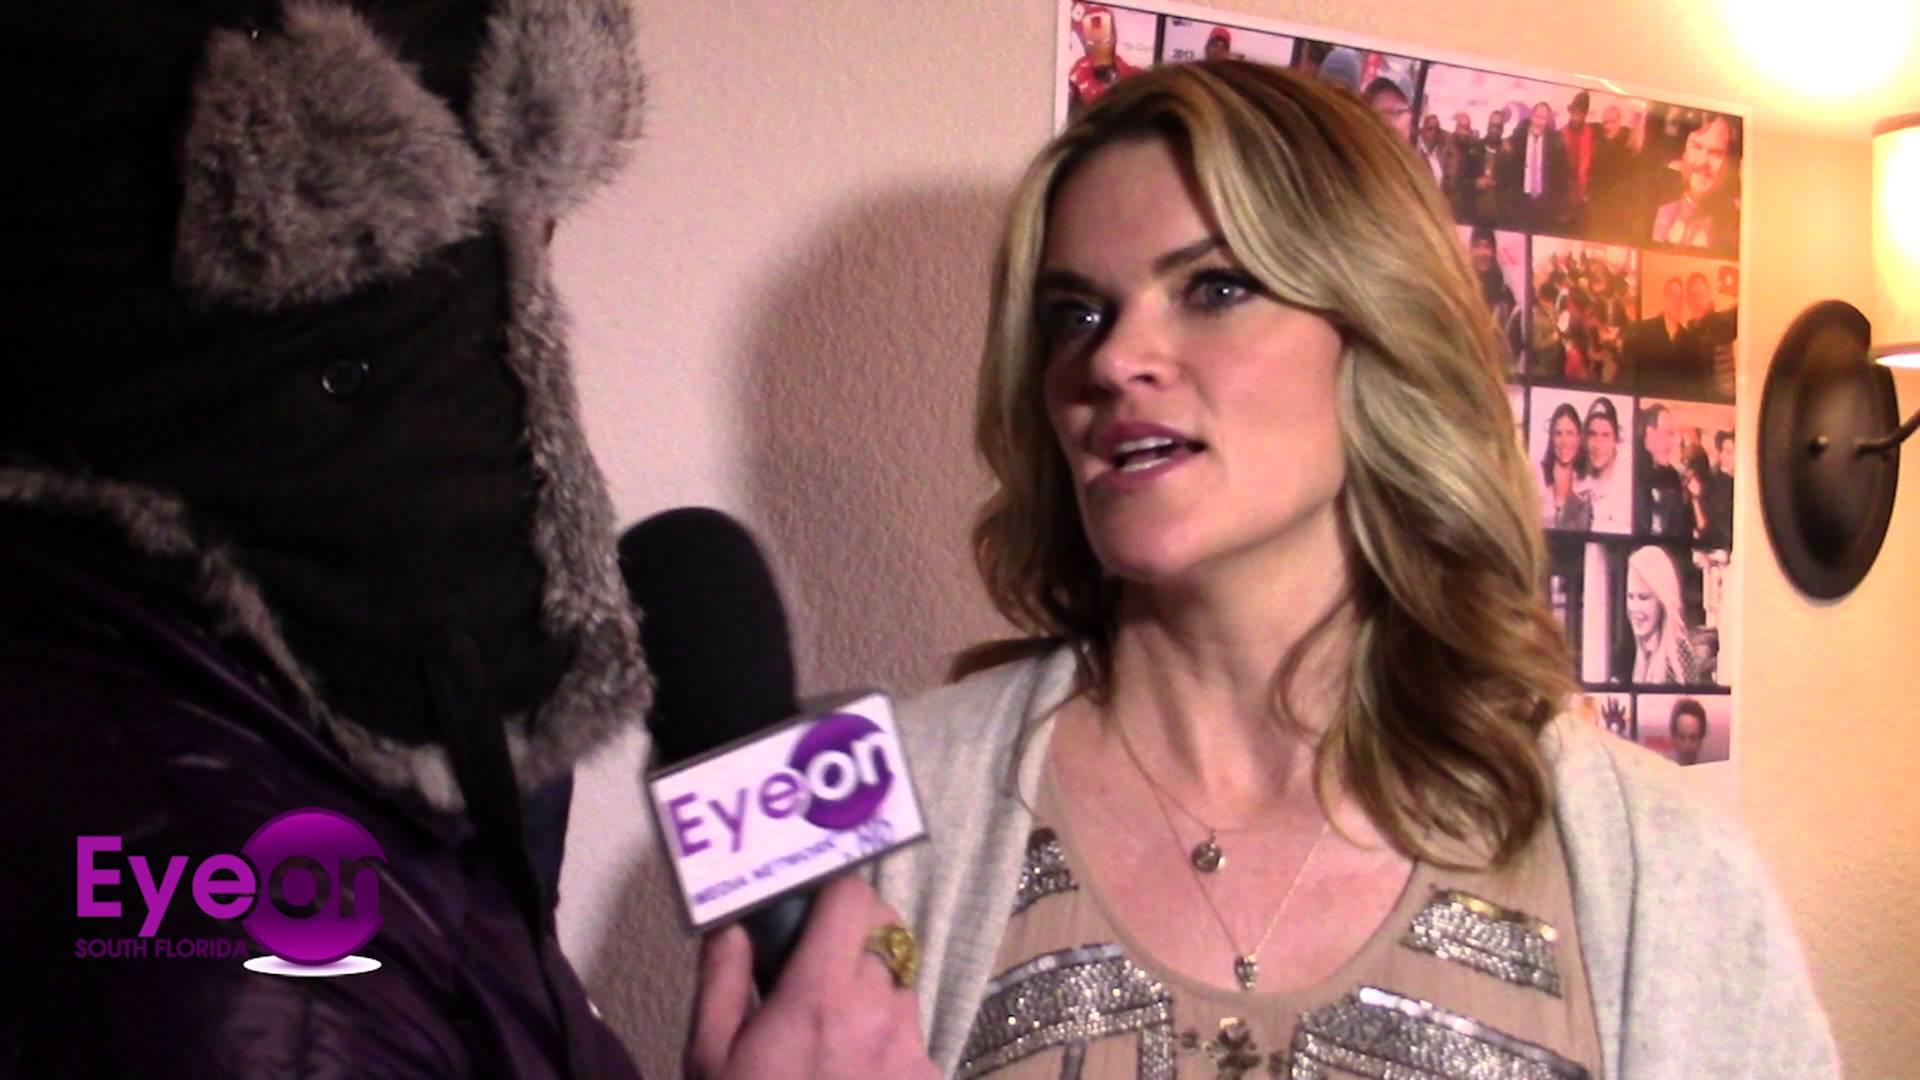 Missi Pyle at Indie Lounge Sundance Film Festival